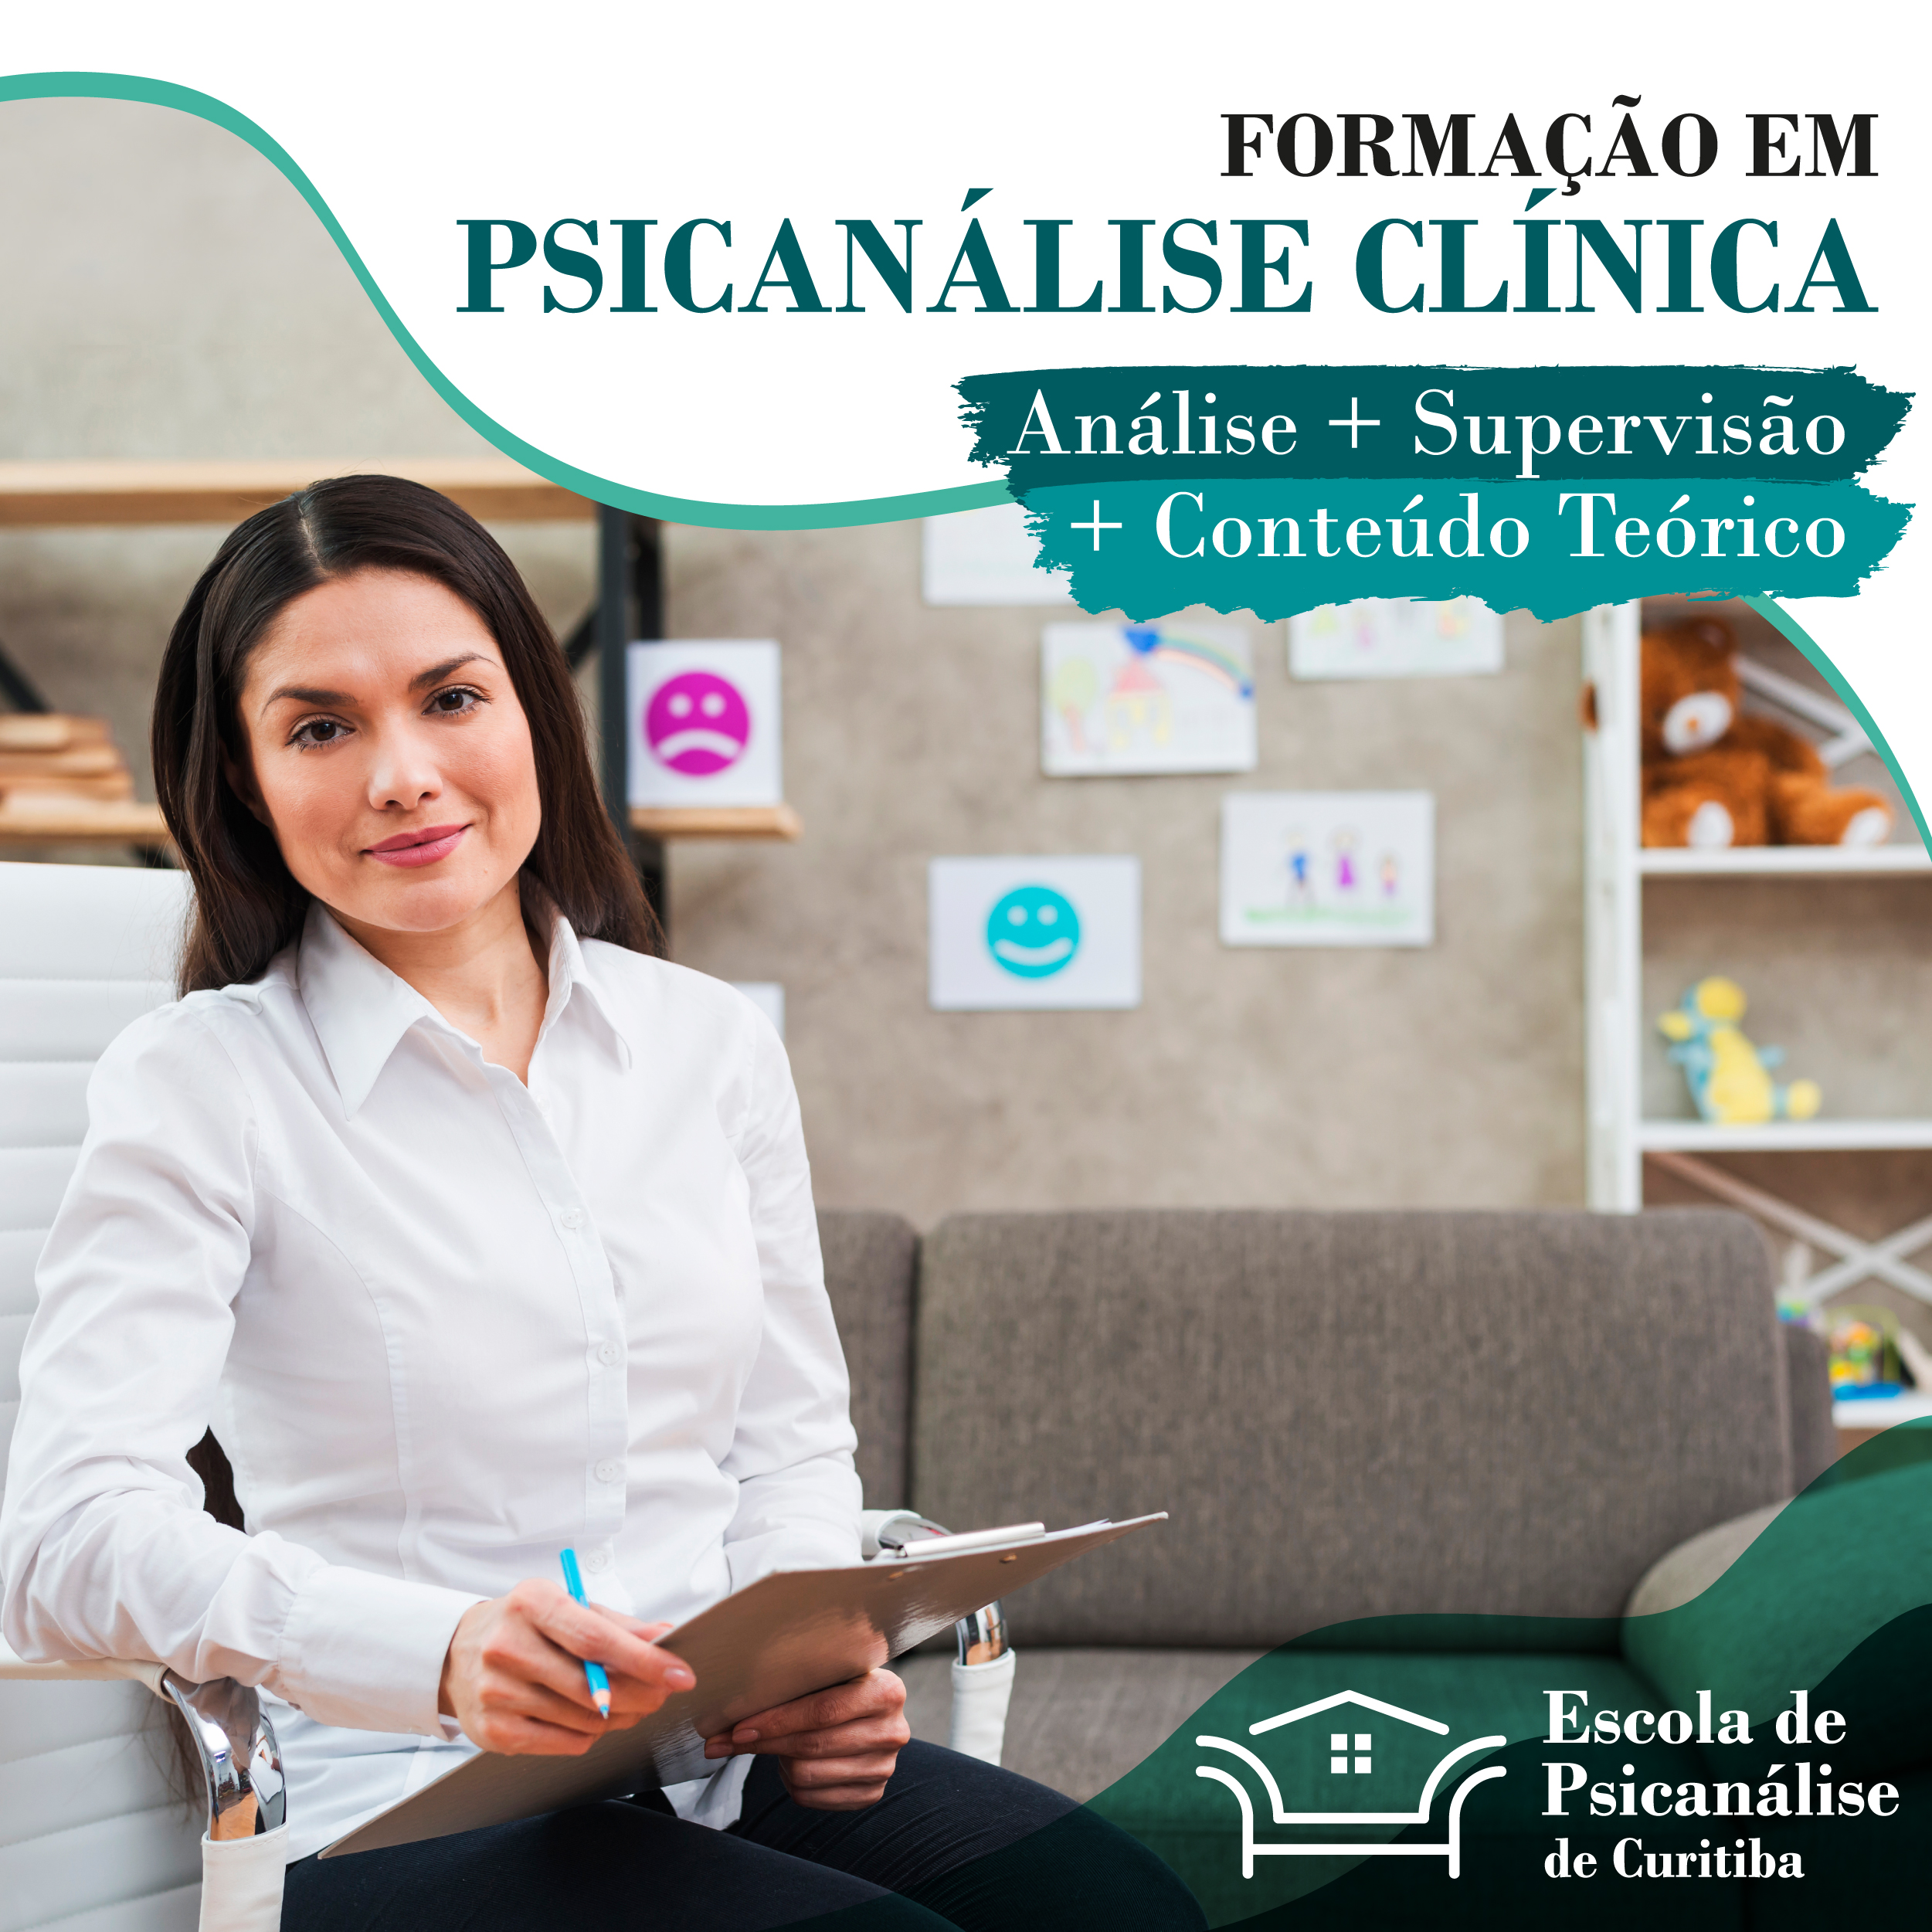 Card Formação Psicanálise Clínica-01